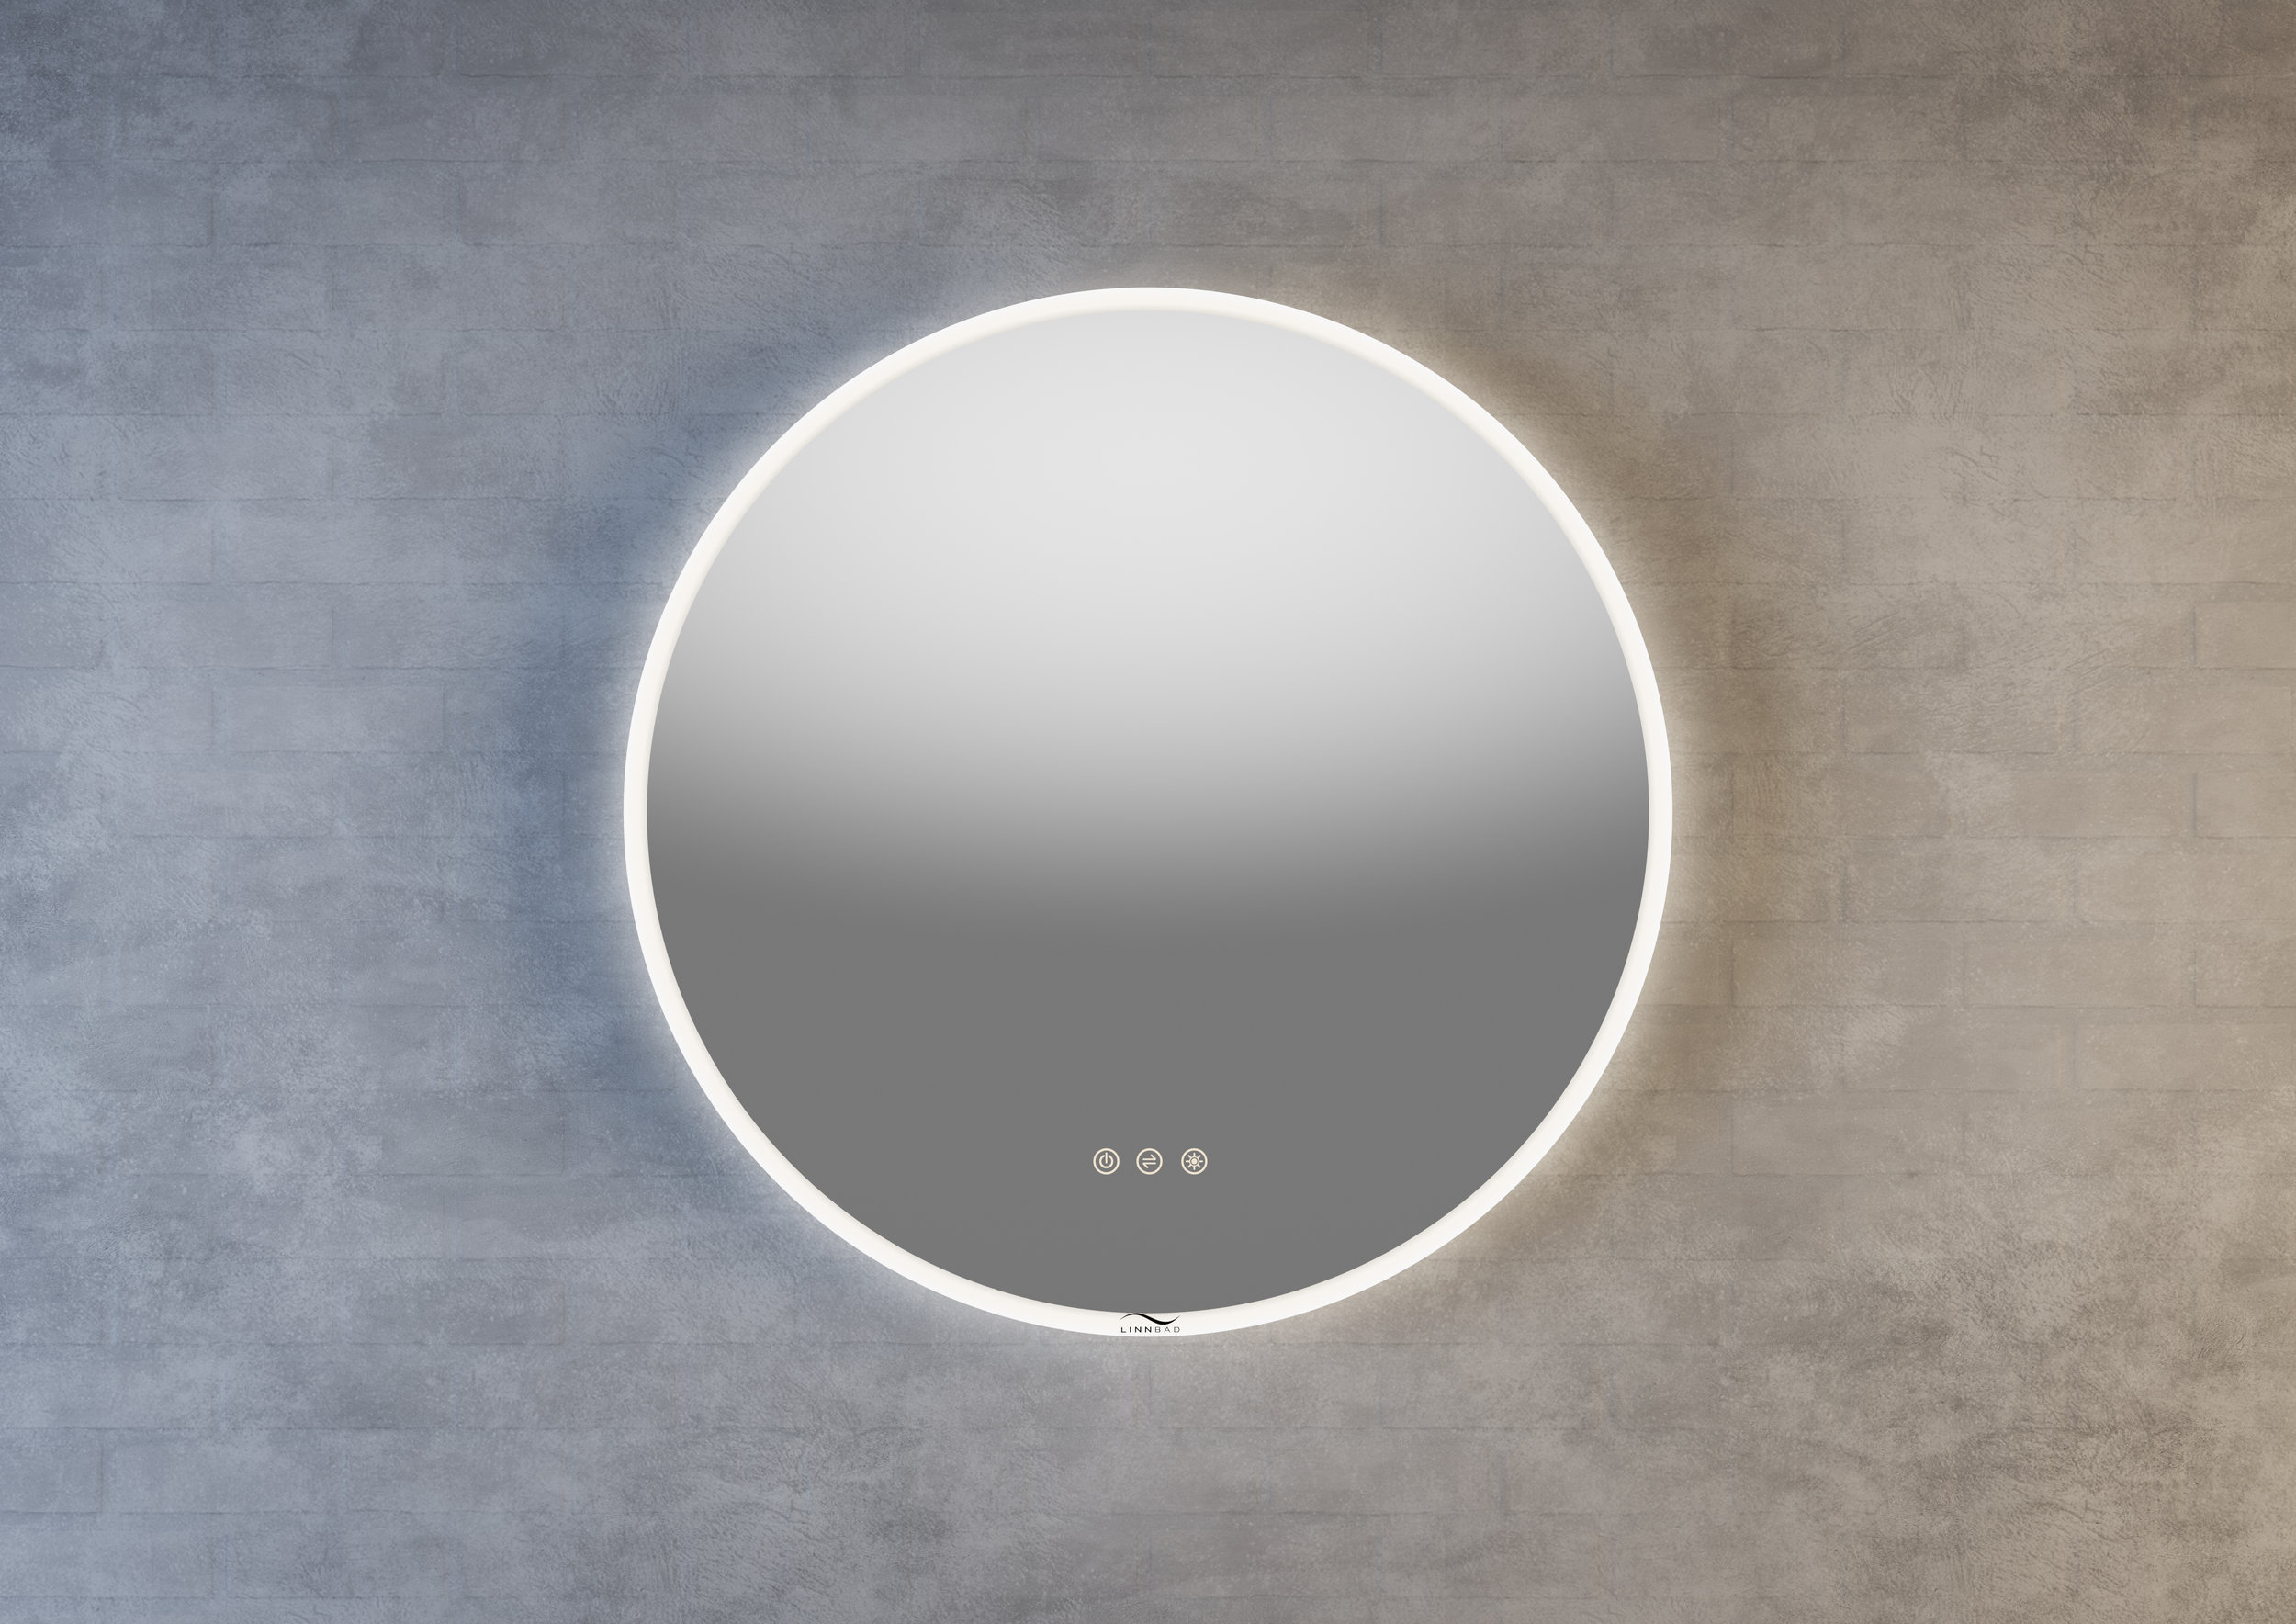 Rundt speil m lyskant 80 cm.jpg